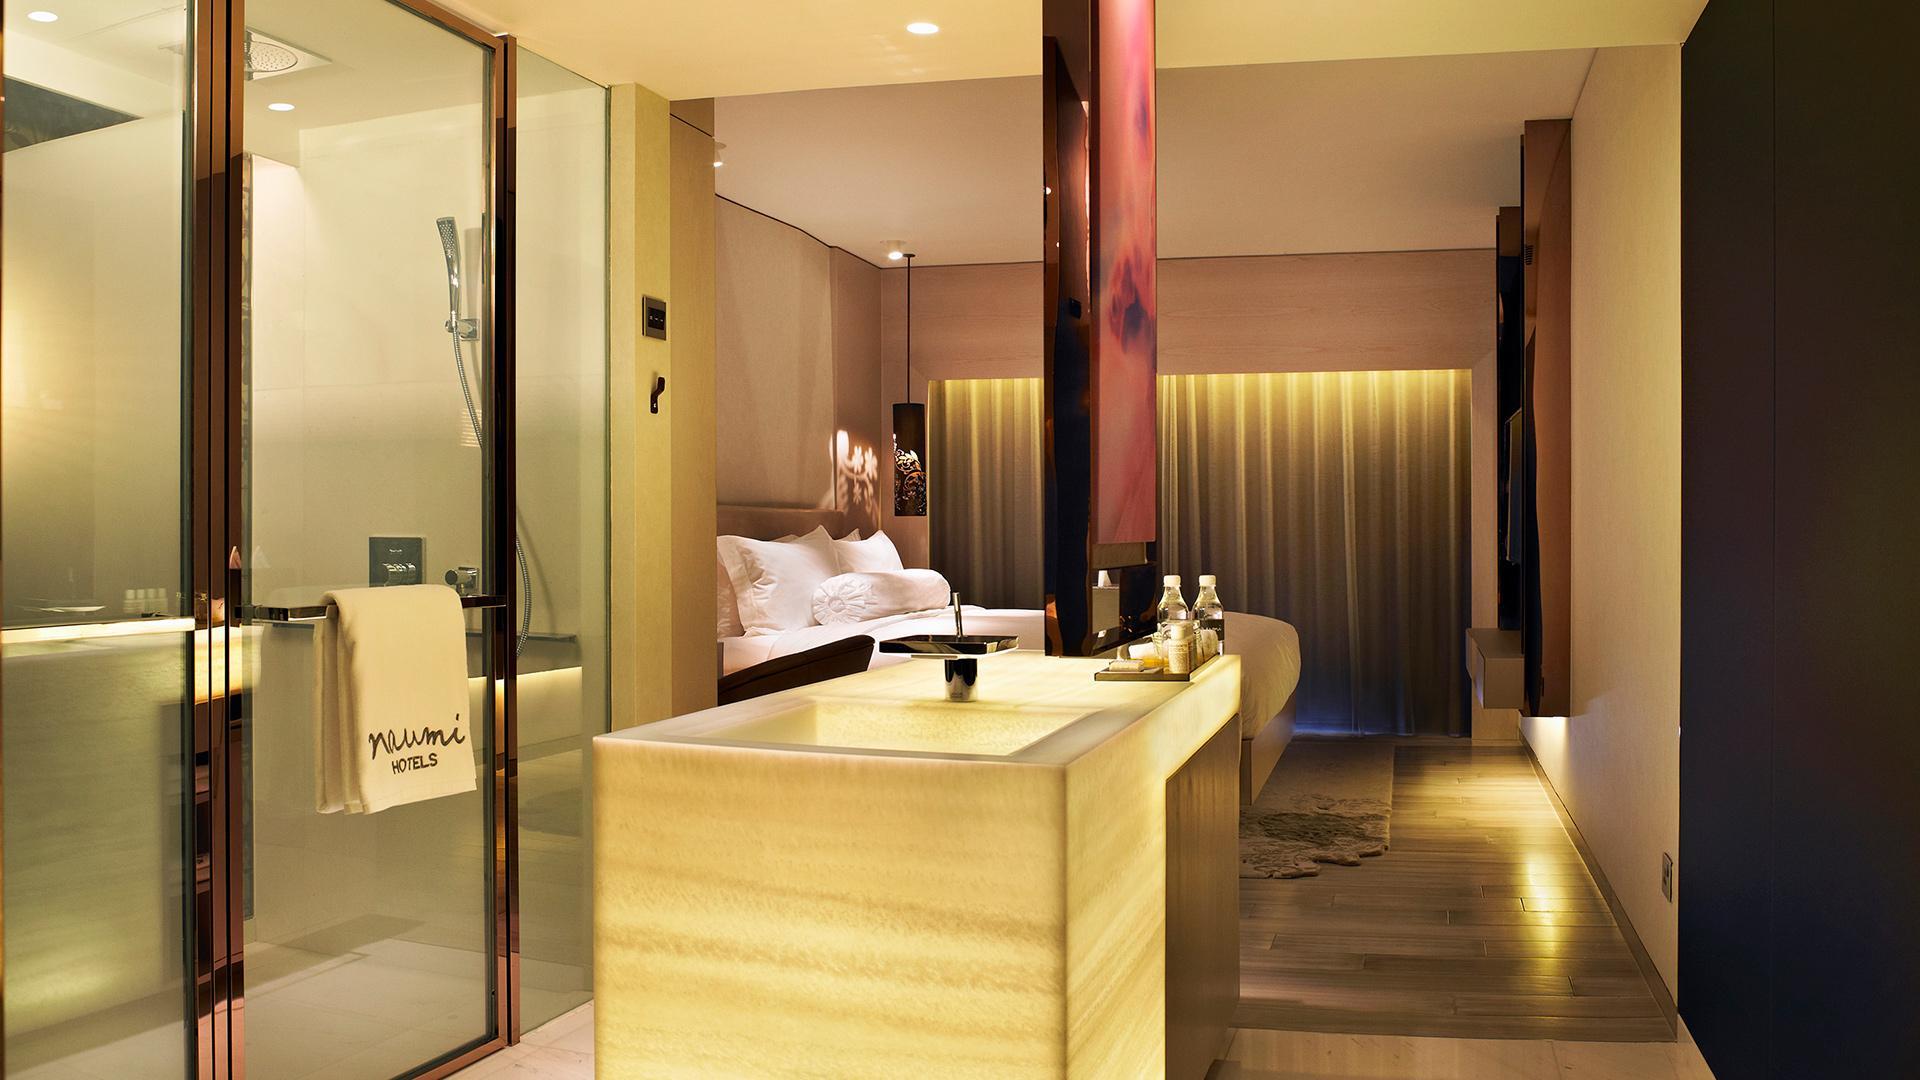 Habitat Room image 1 at Naumi Hotel Singapore by null, null, Singapore